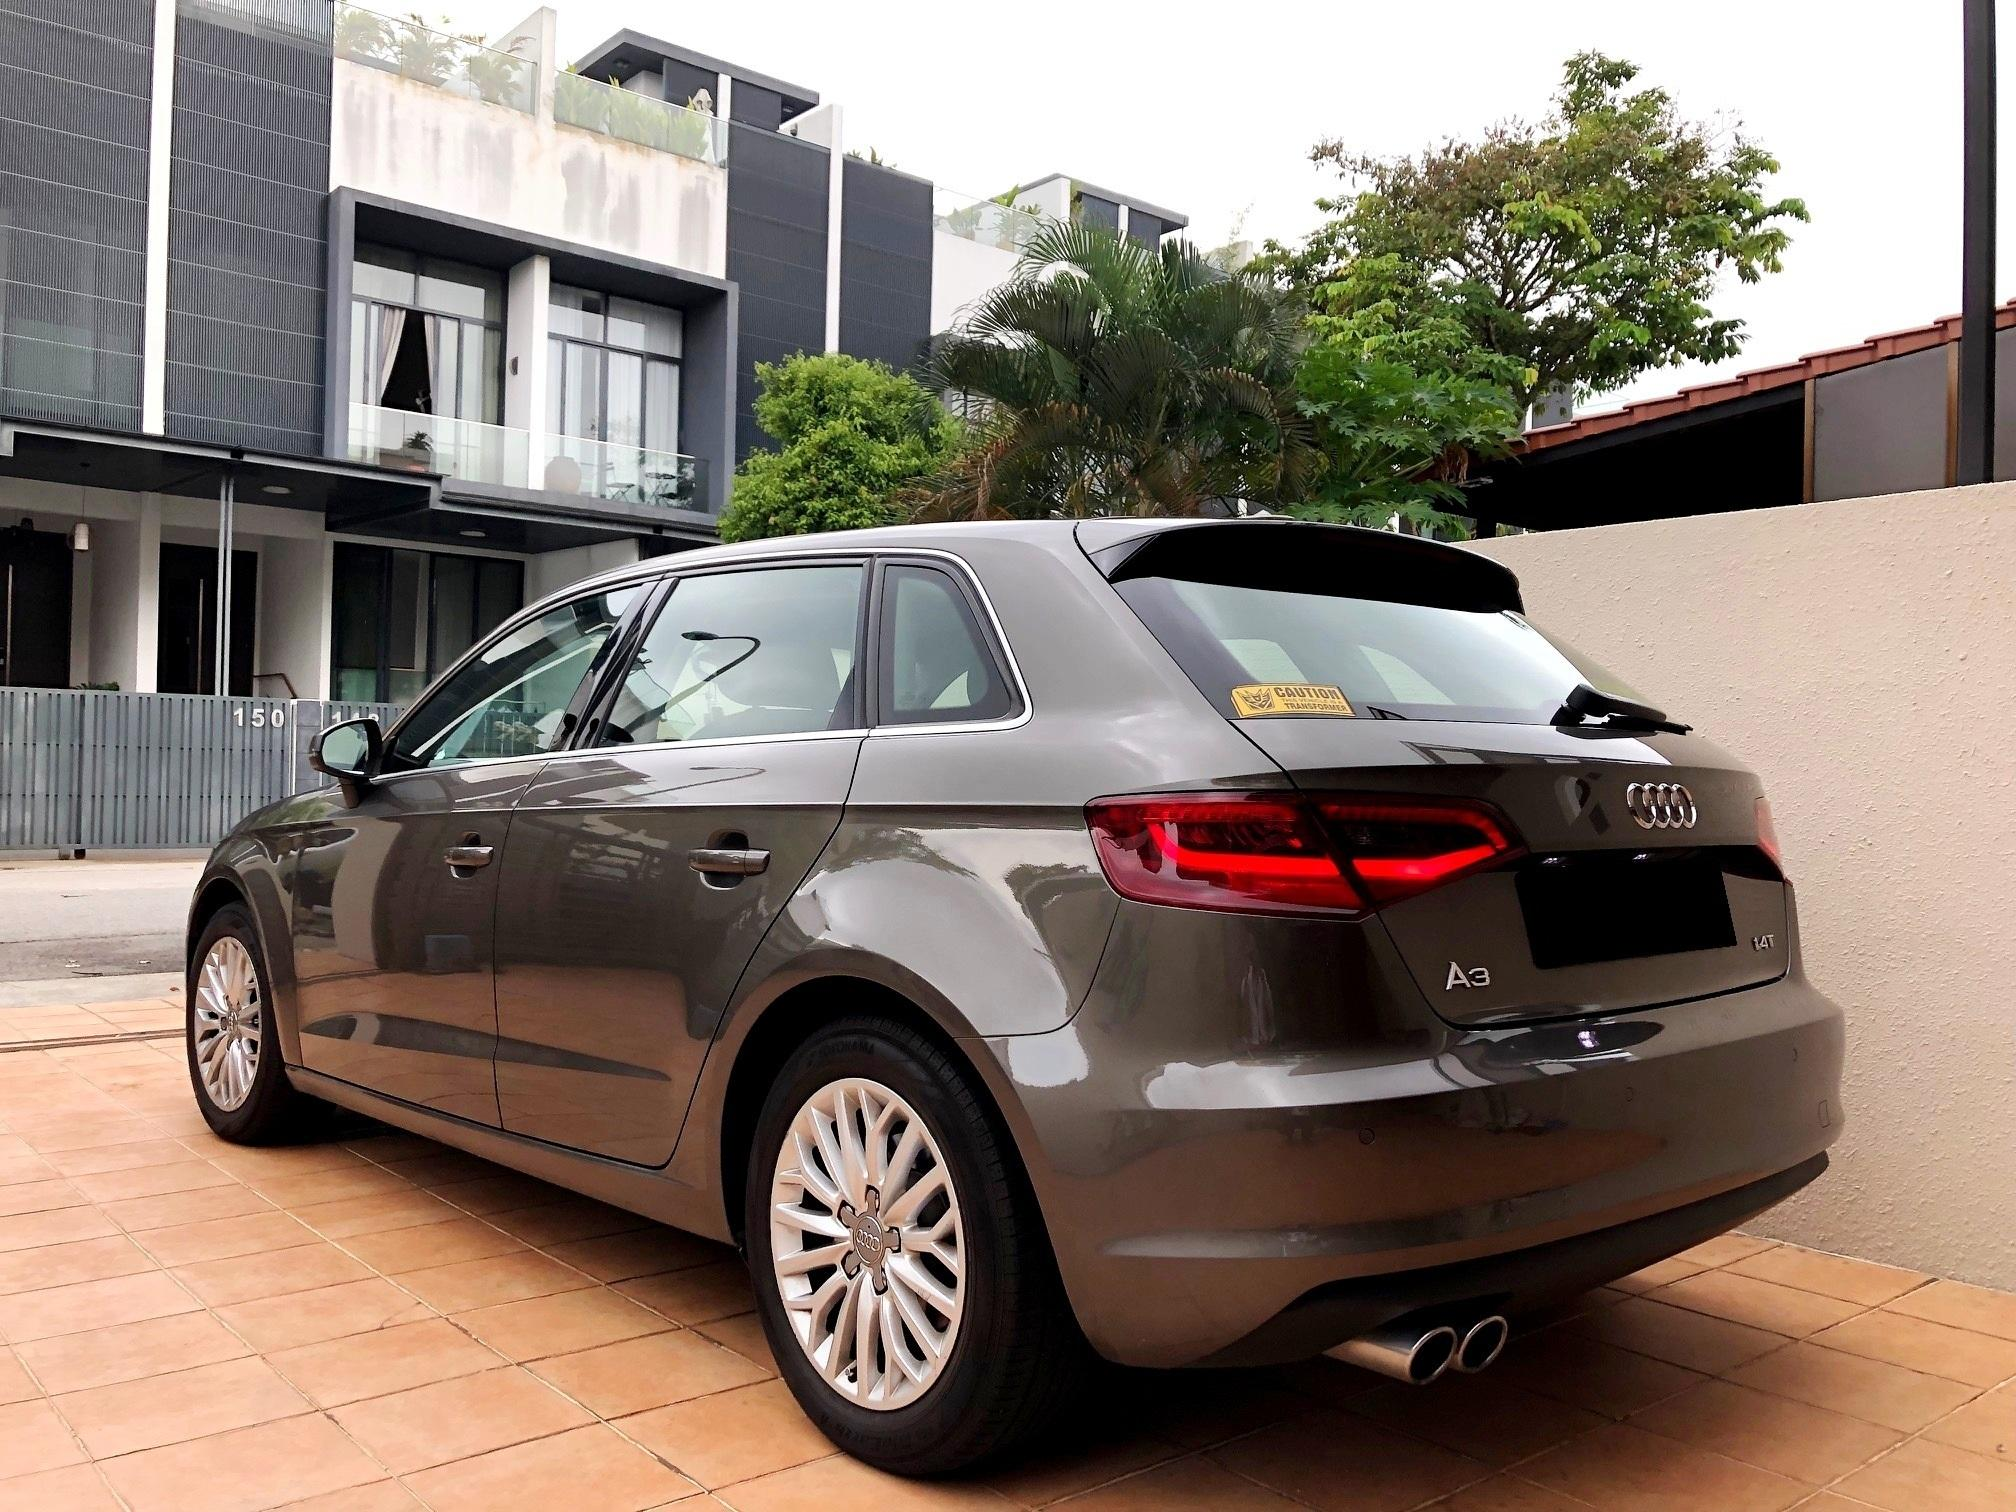 Audi A3 Sportback 1.4 TFSI S tronic 5-Dr Ambiente Auto